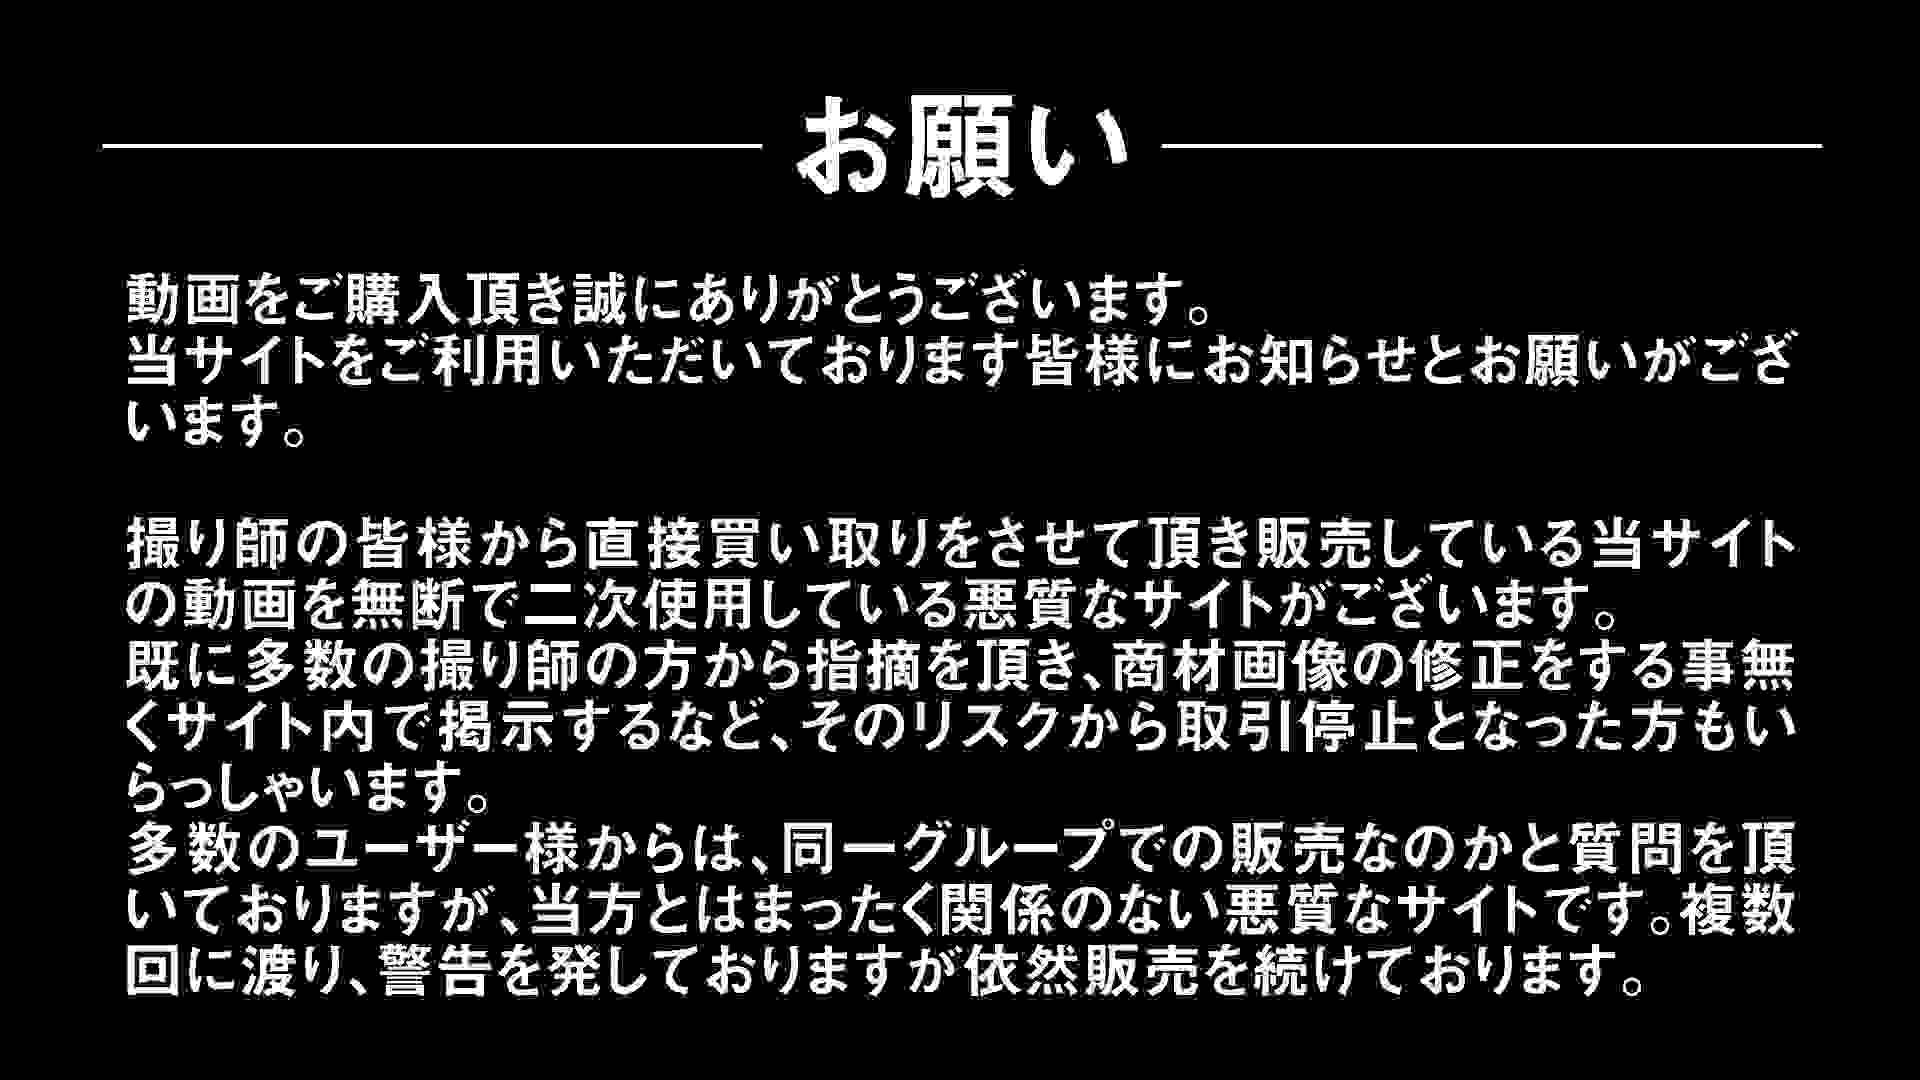 Aquaな露天風呂Vol.301 0 | 0  11連発 1